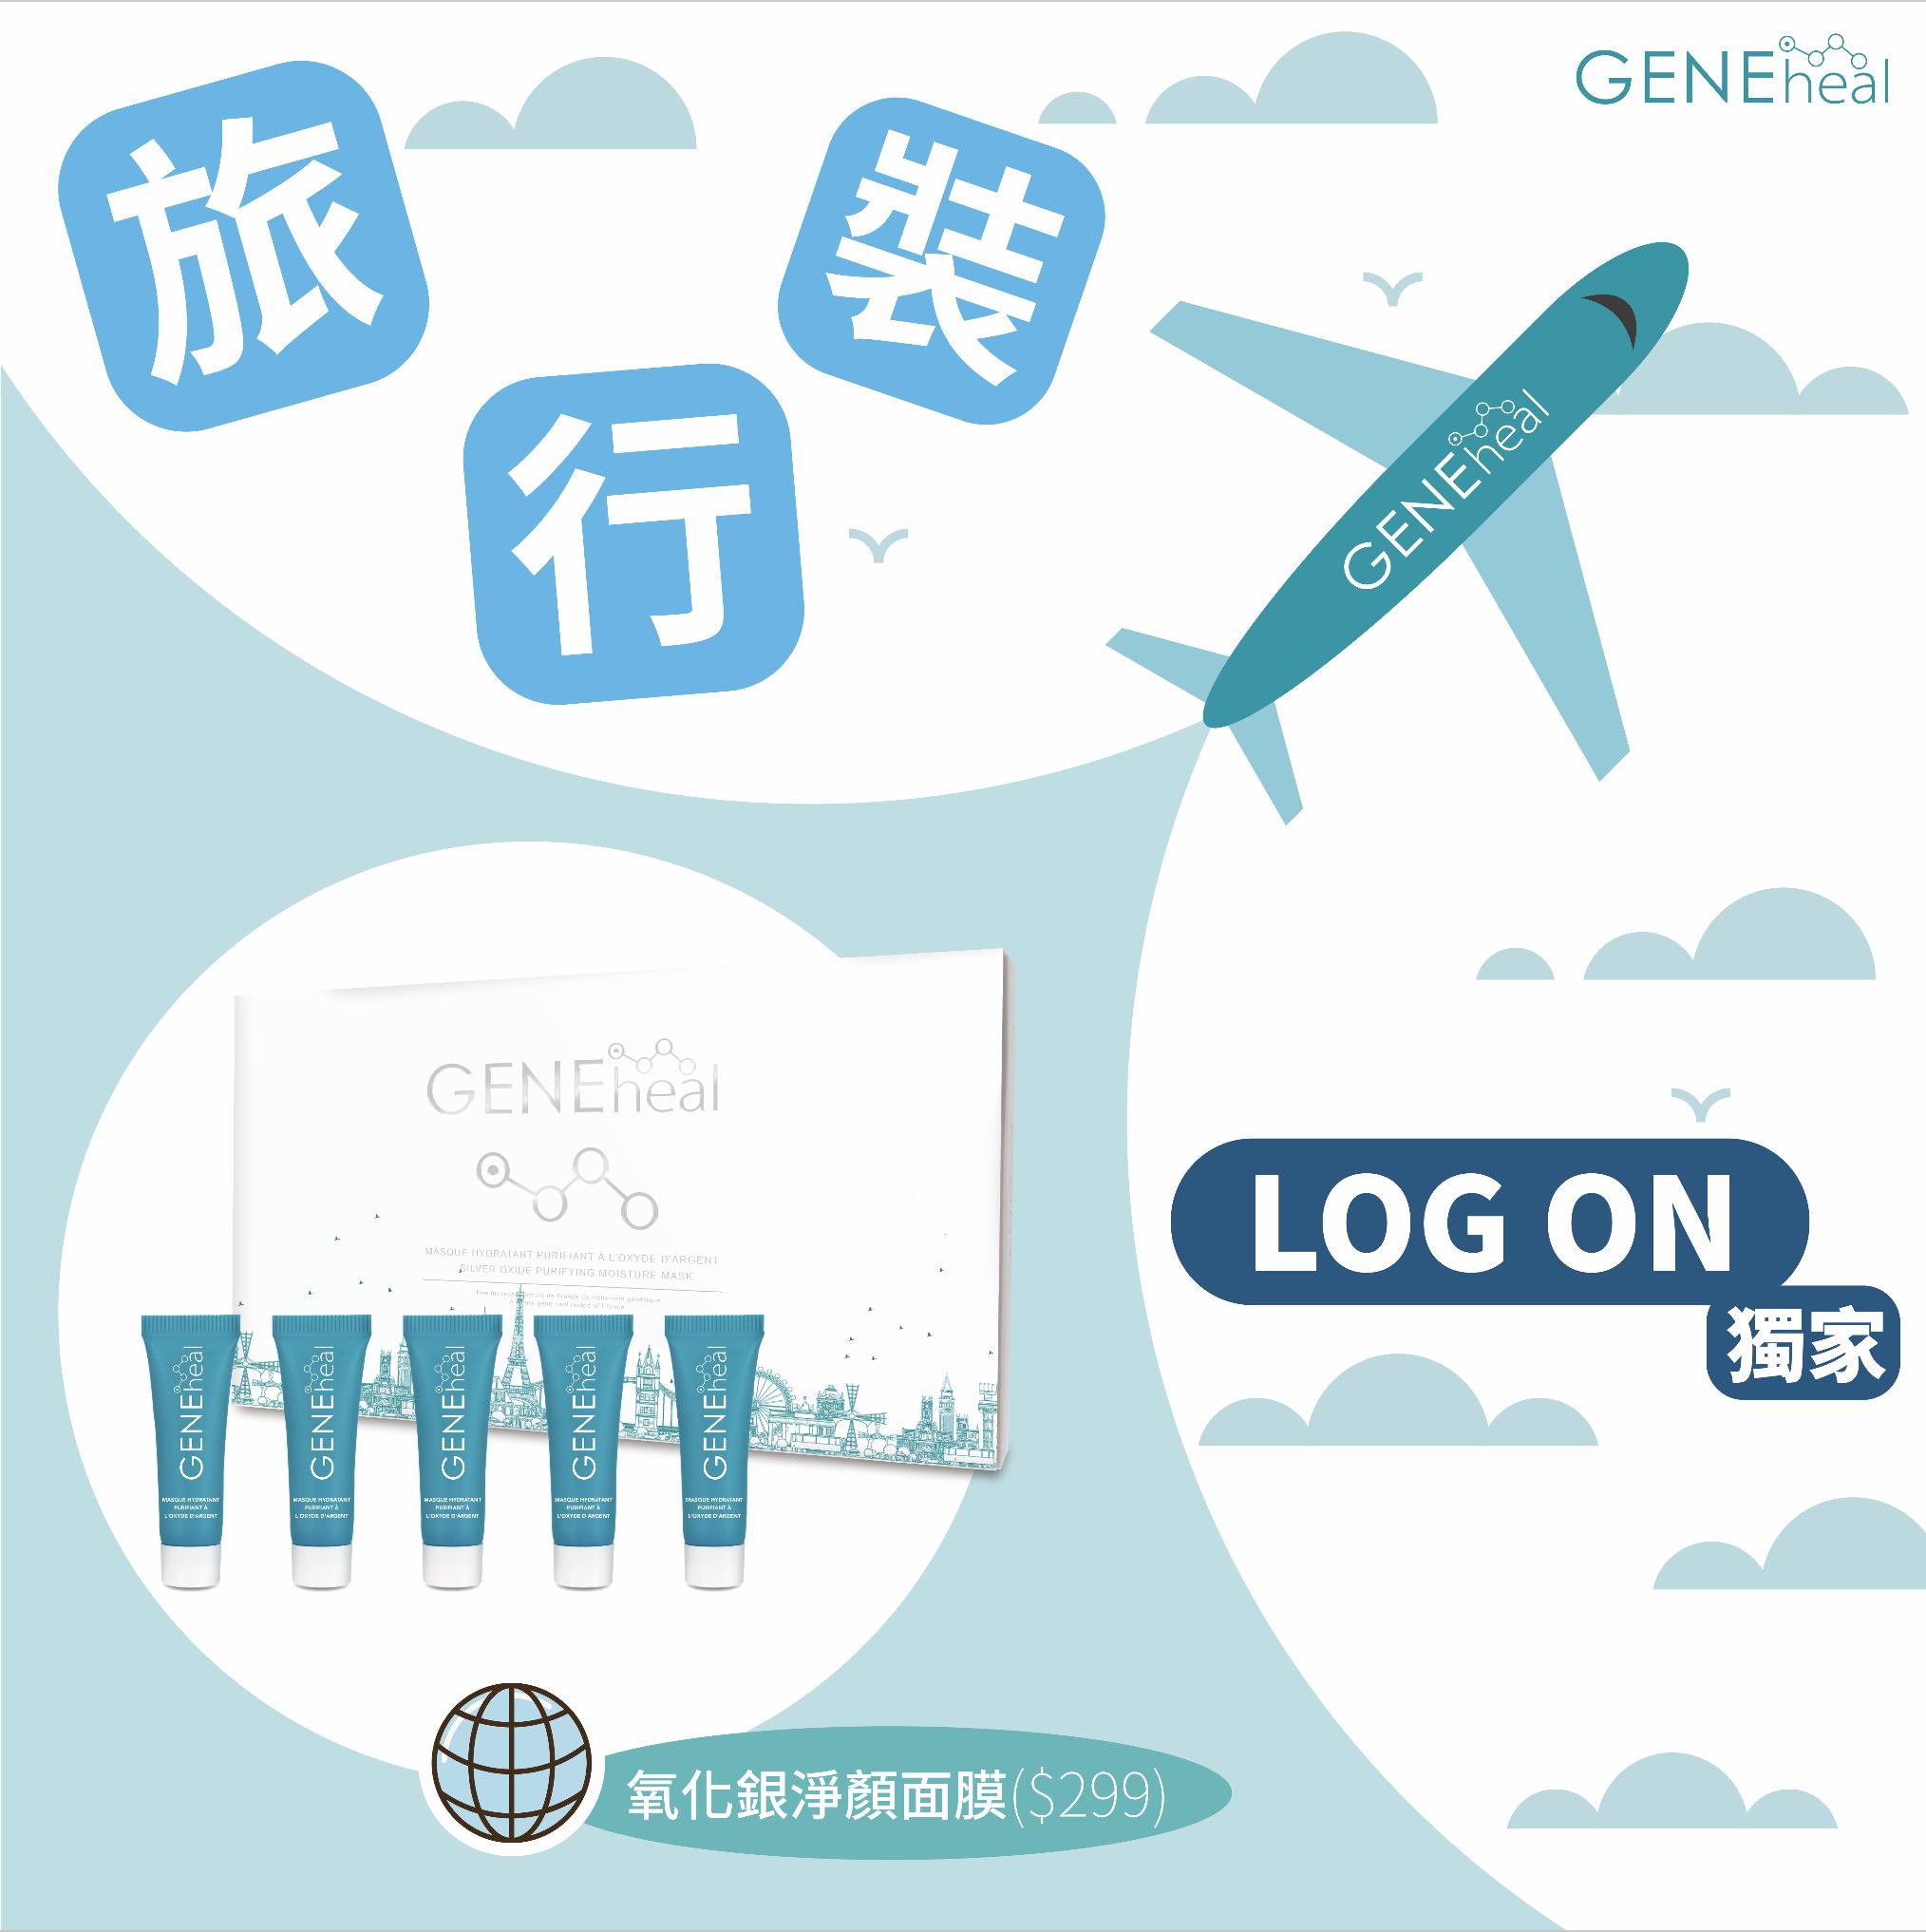 GENEliftox 100 - 氧化銀淨顏面膜 - 旅行裝